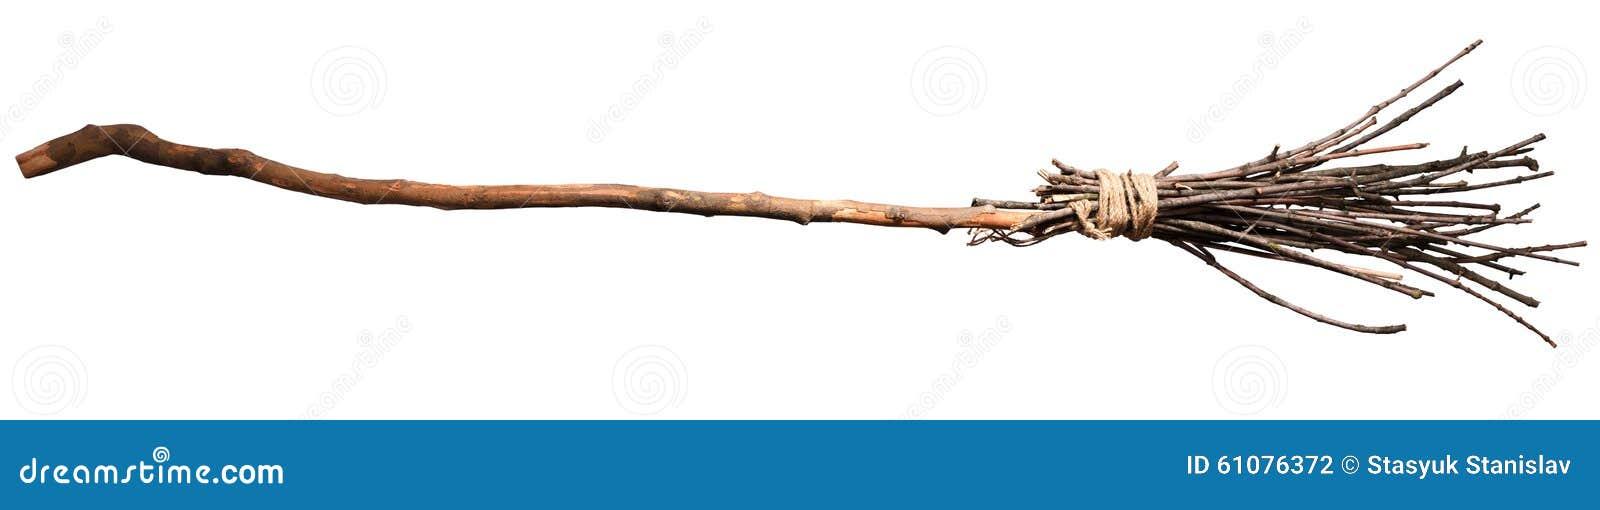 Witches Broom Stock Photo Image 61076372